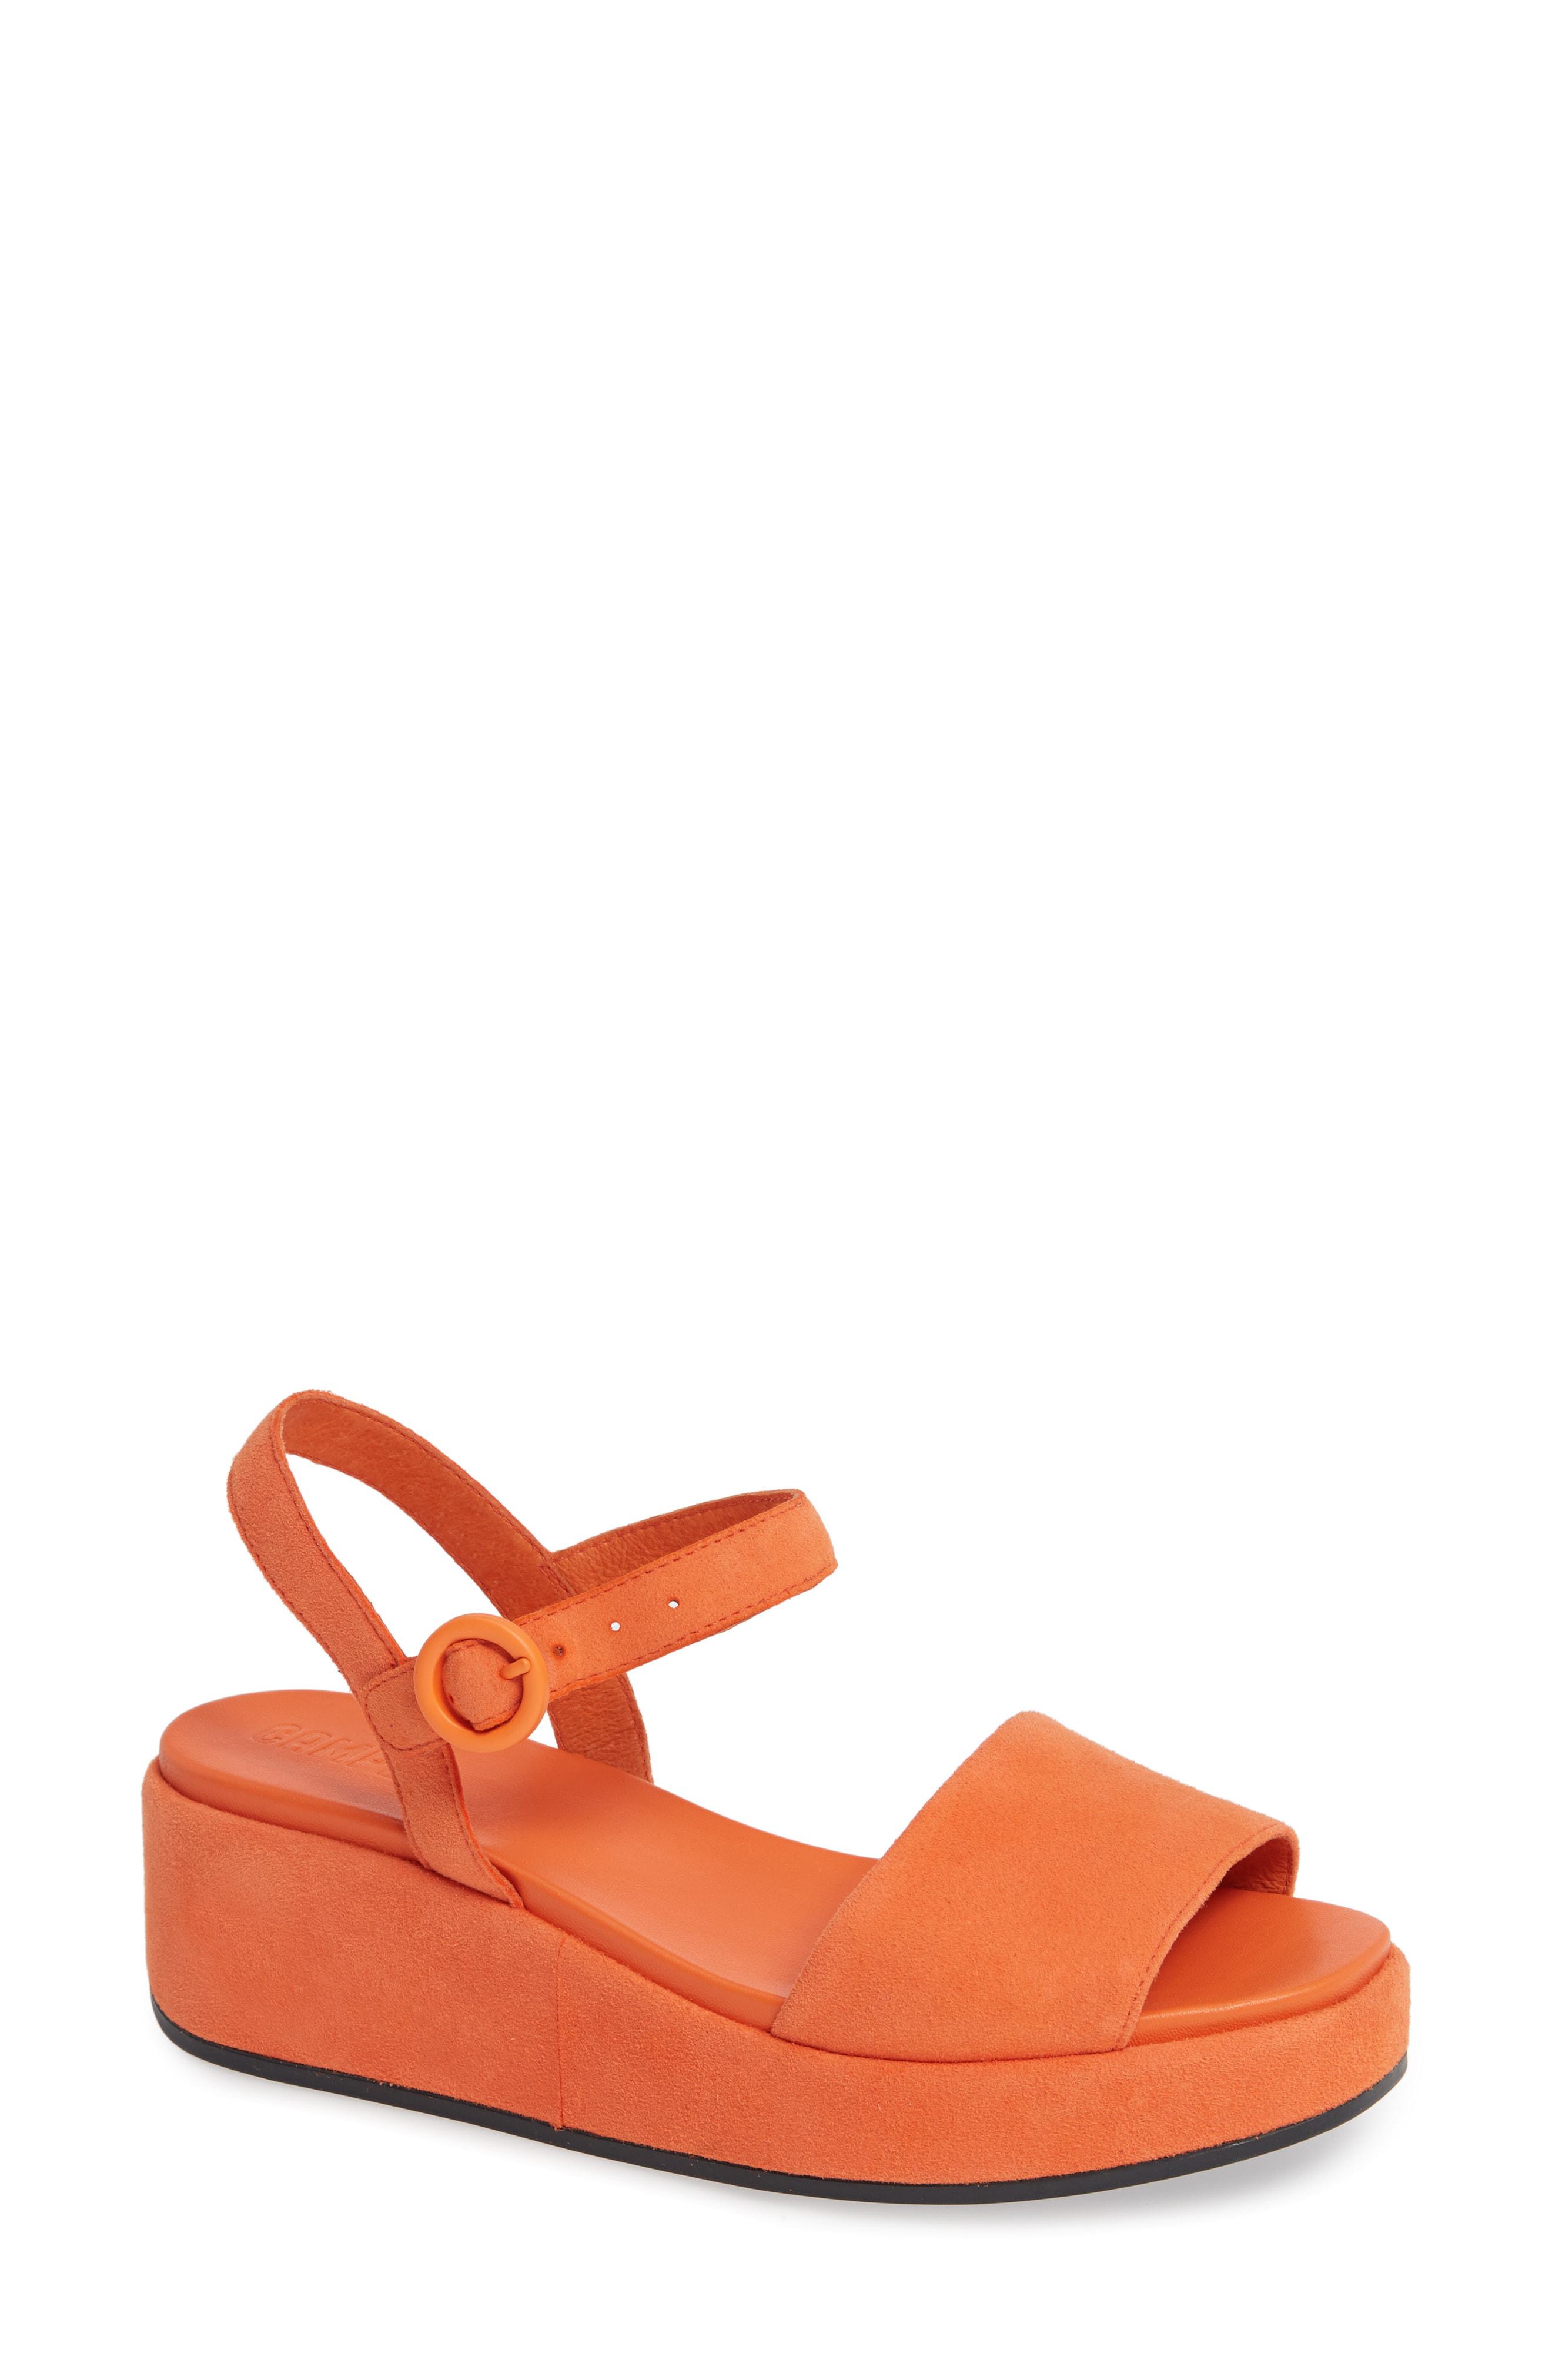 5dd14404fd9 Camper Misia Platform Wedge Sandal In Medium Orange Leather